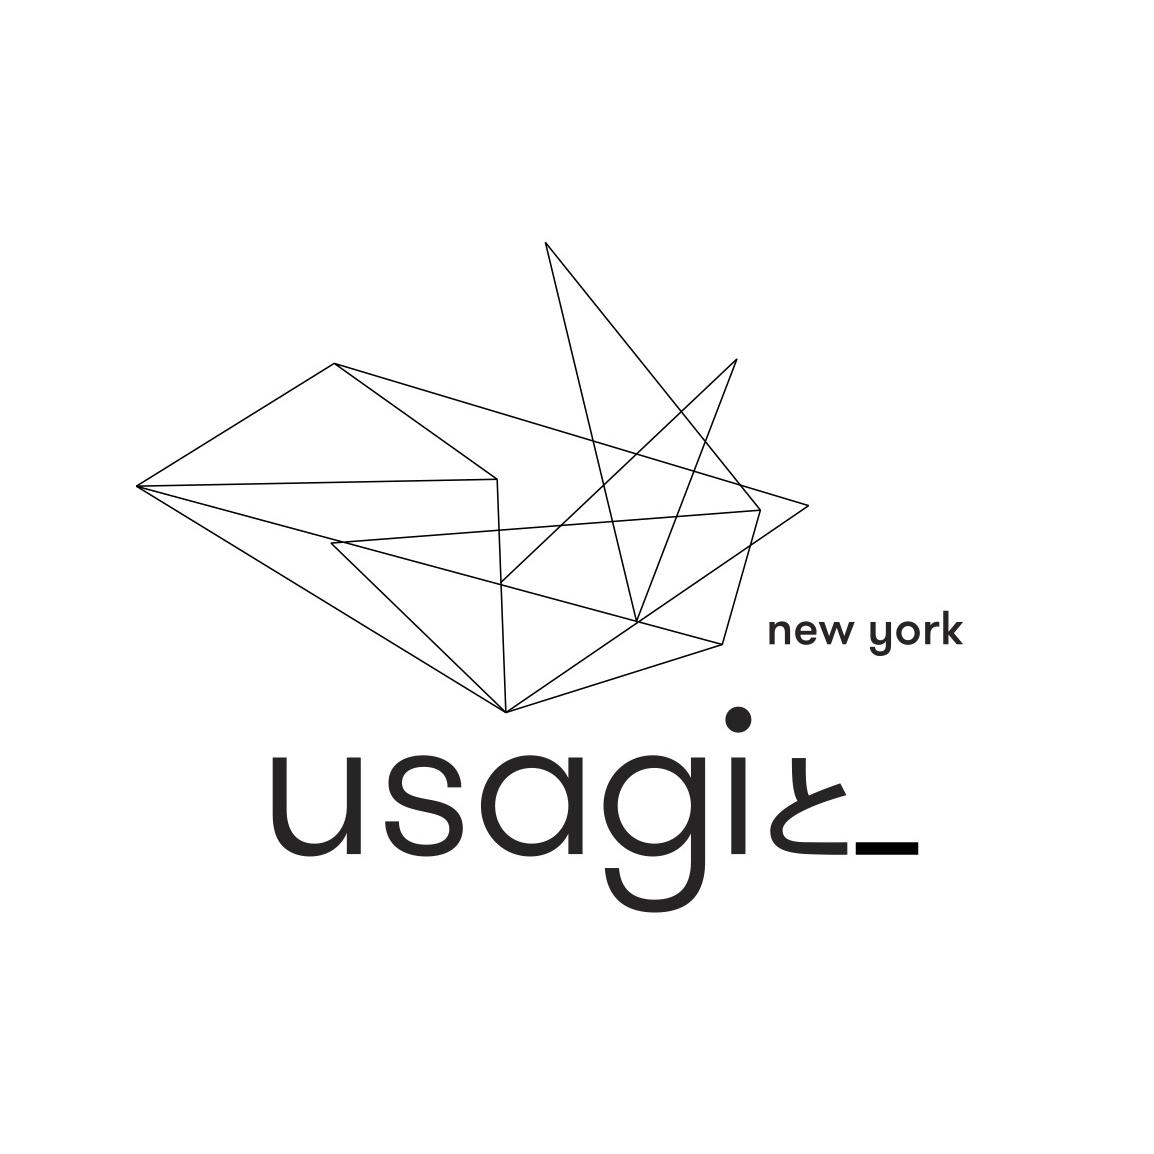 usagi_newyork_logo.jpg